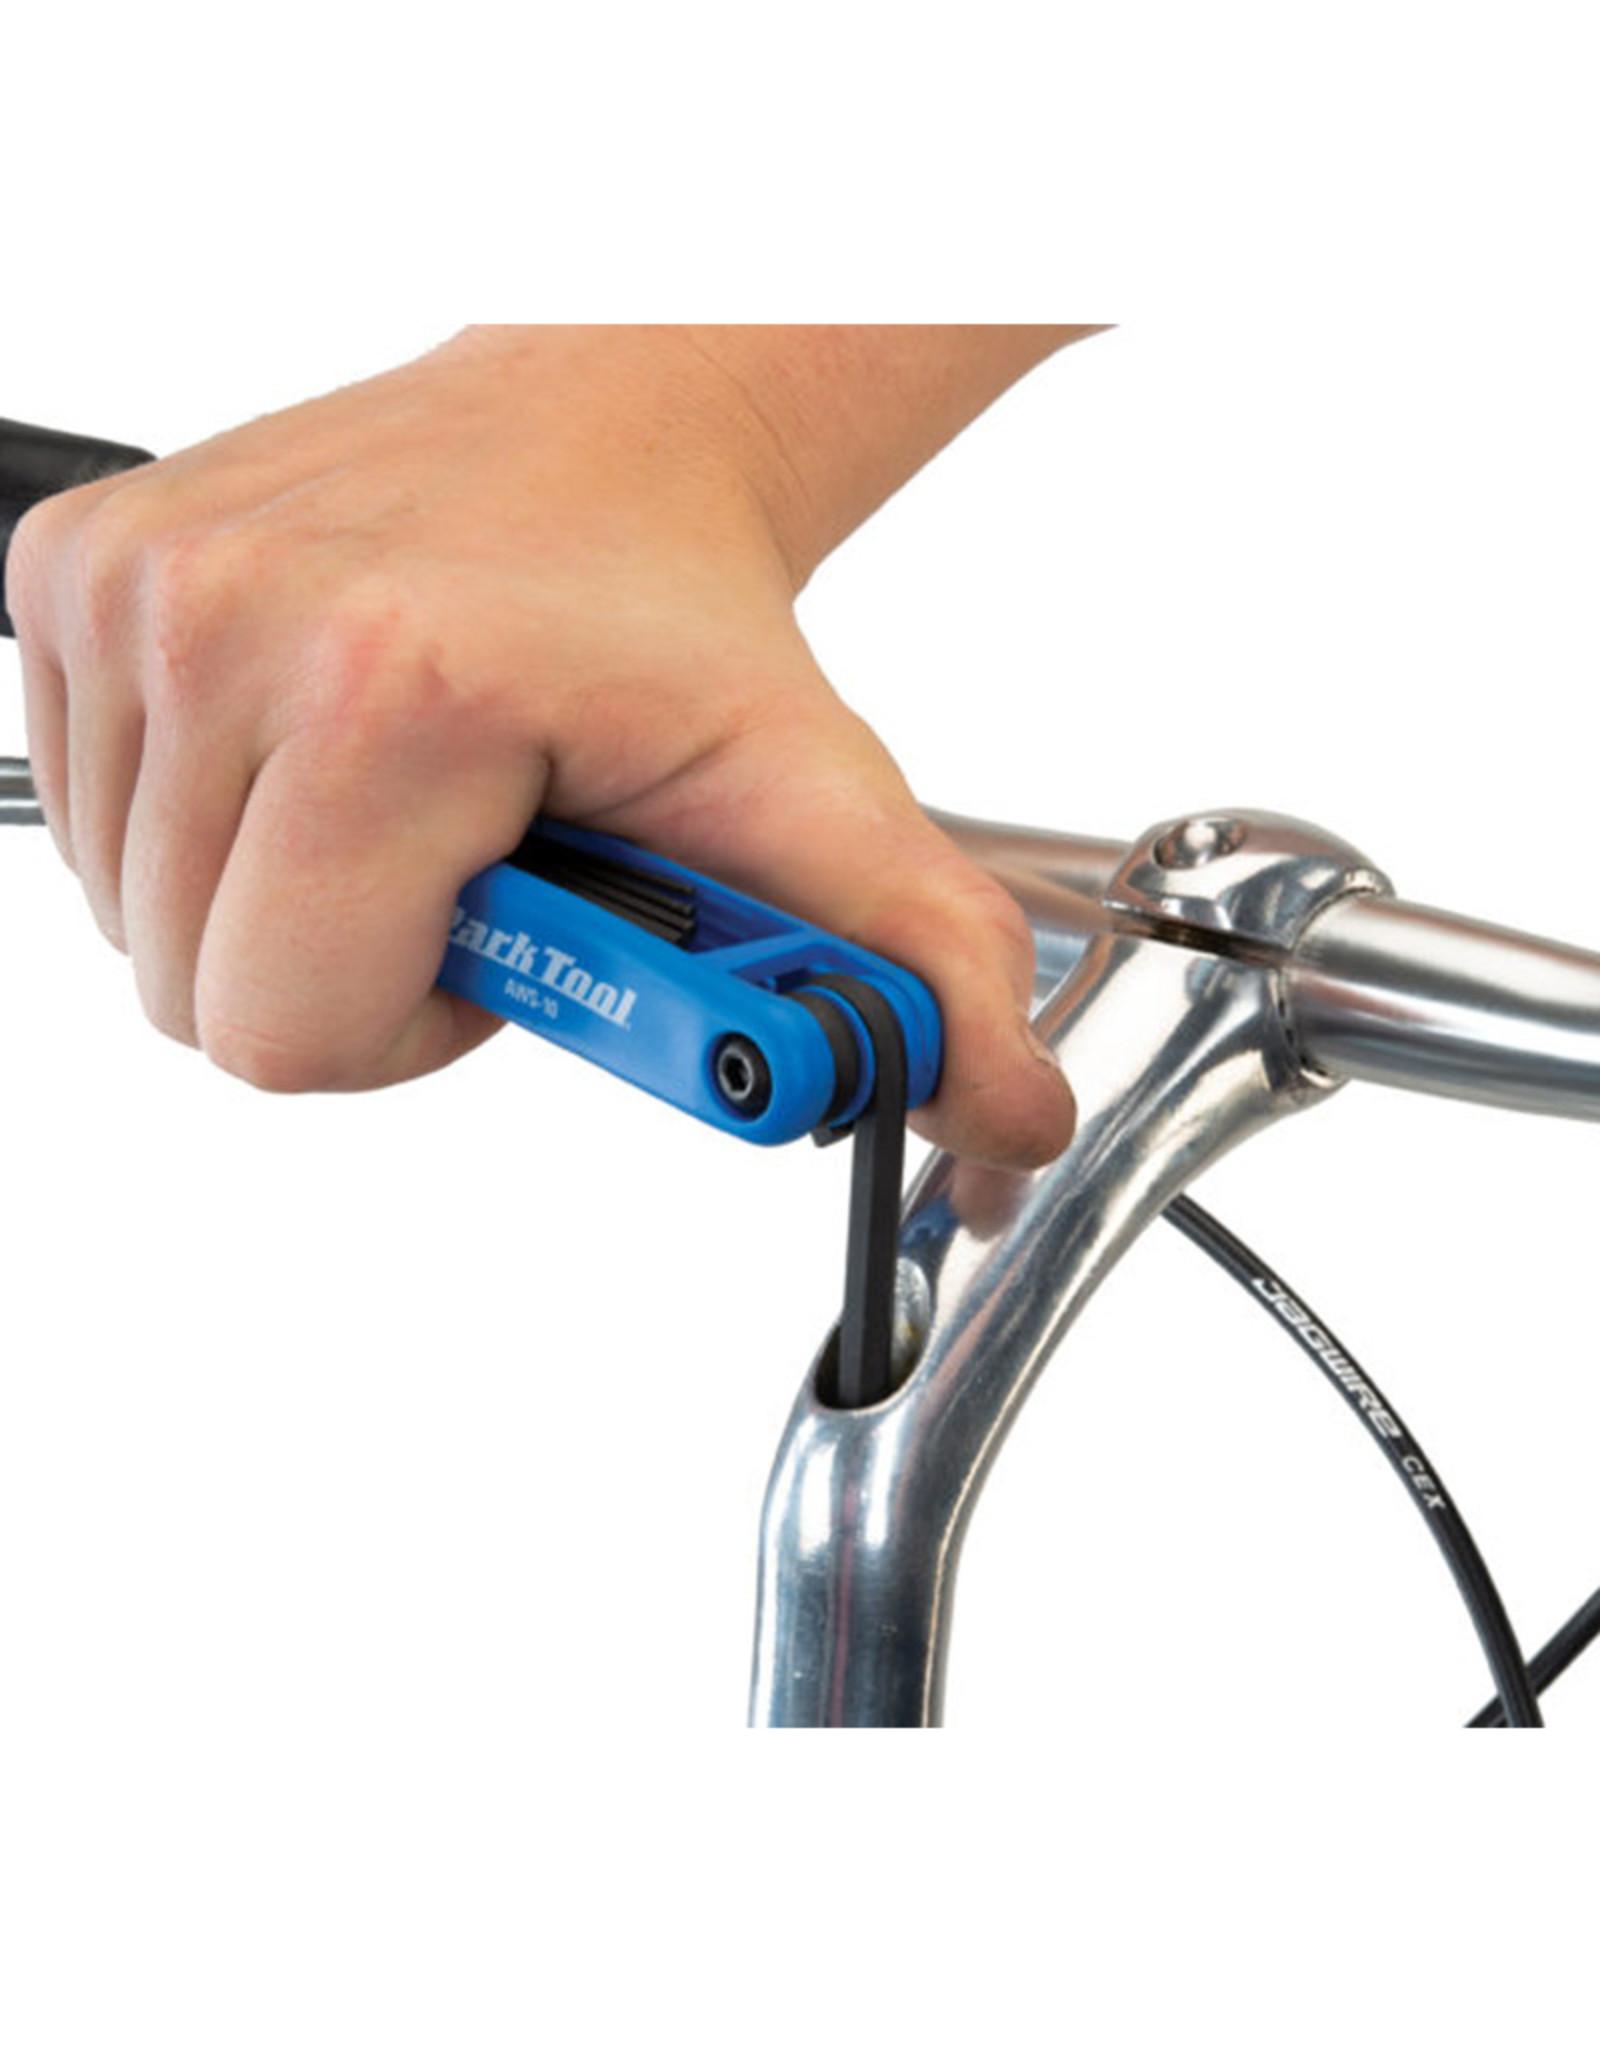 Park Tool Park Tool, AWS-10, Clés hexagonales repliables, 1.5mm, 2mm, 2.5mm, 3m, 4mm, 5mm et 6mm